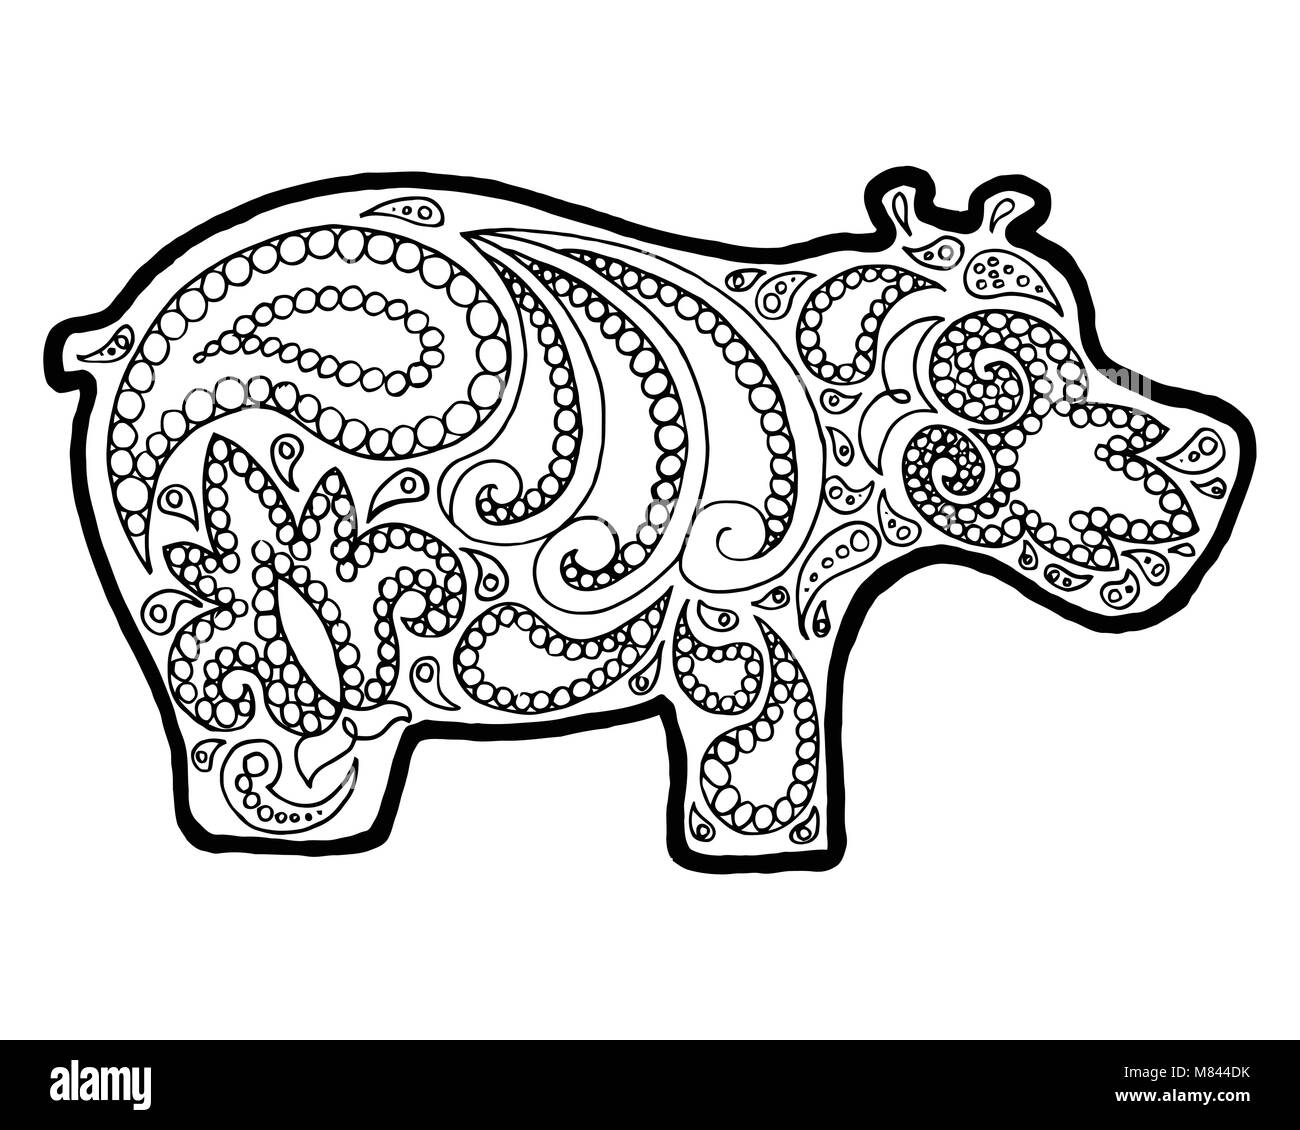 Animal Zen Vector Illustration Coloring Book Hippopotamus Black And White